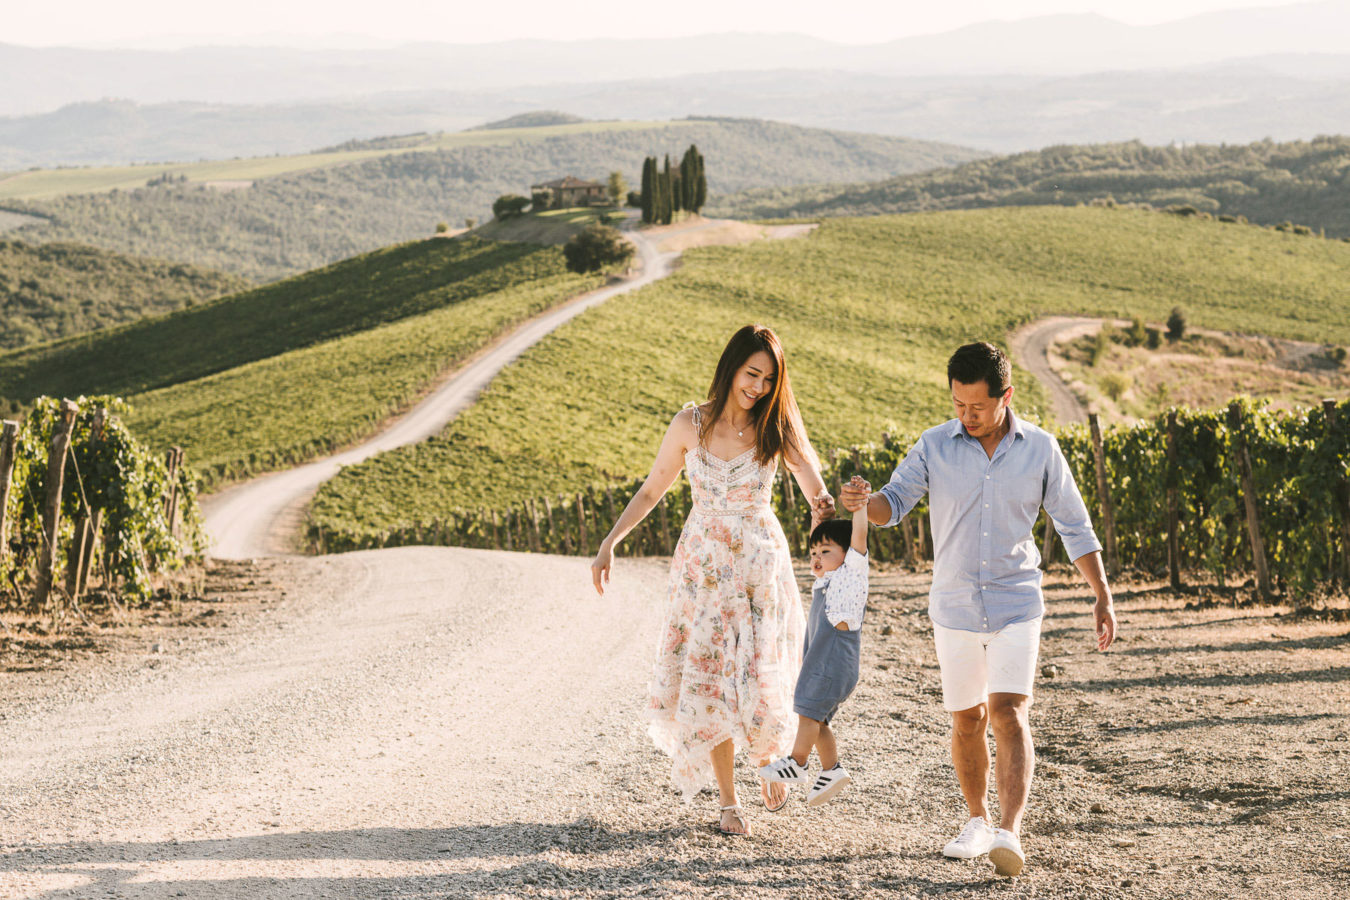 Family photo shoot Rosewood Castiglion del Bosco Tuscany countryside